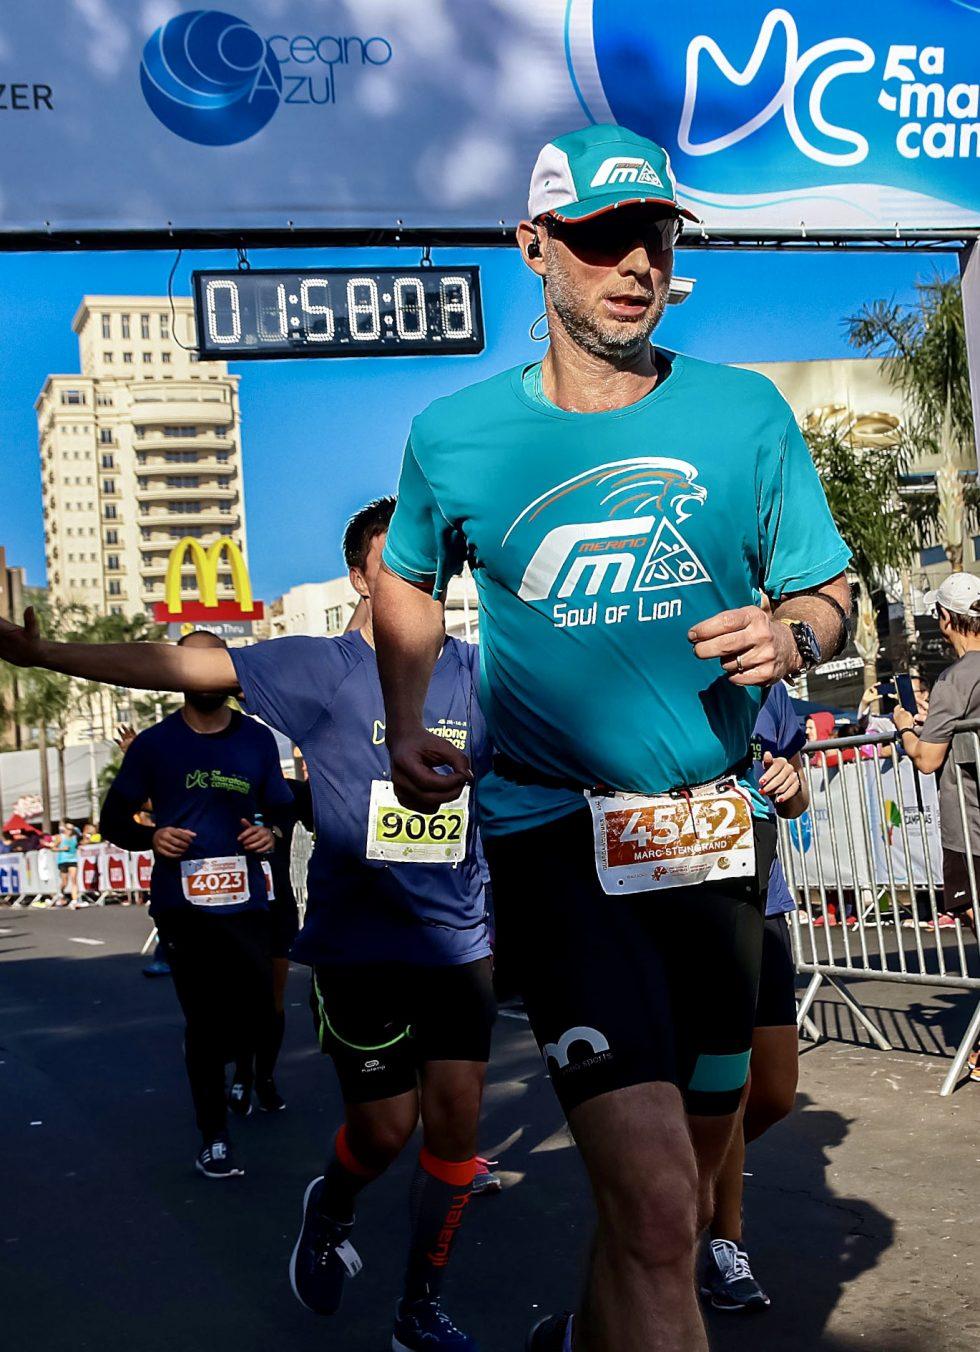 maratona de campinas finisher sporttechtips